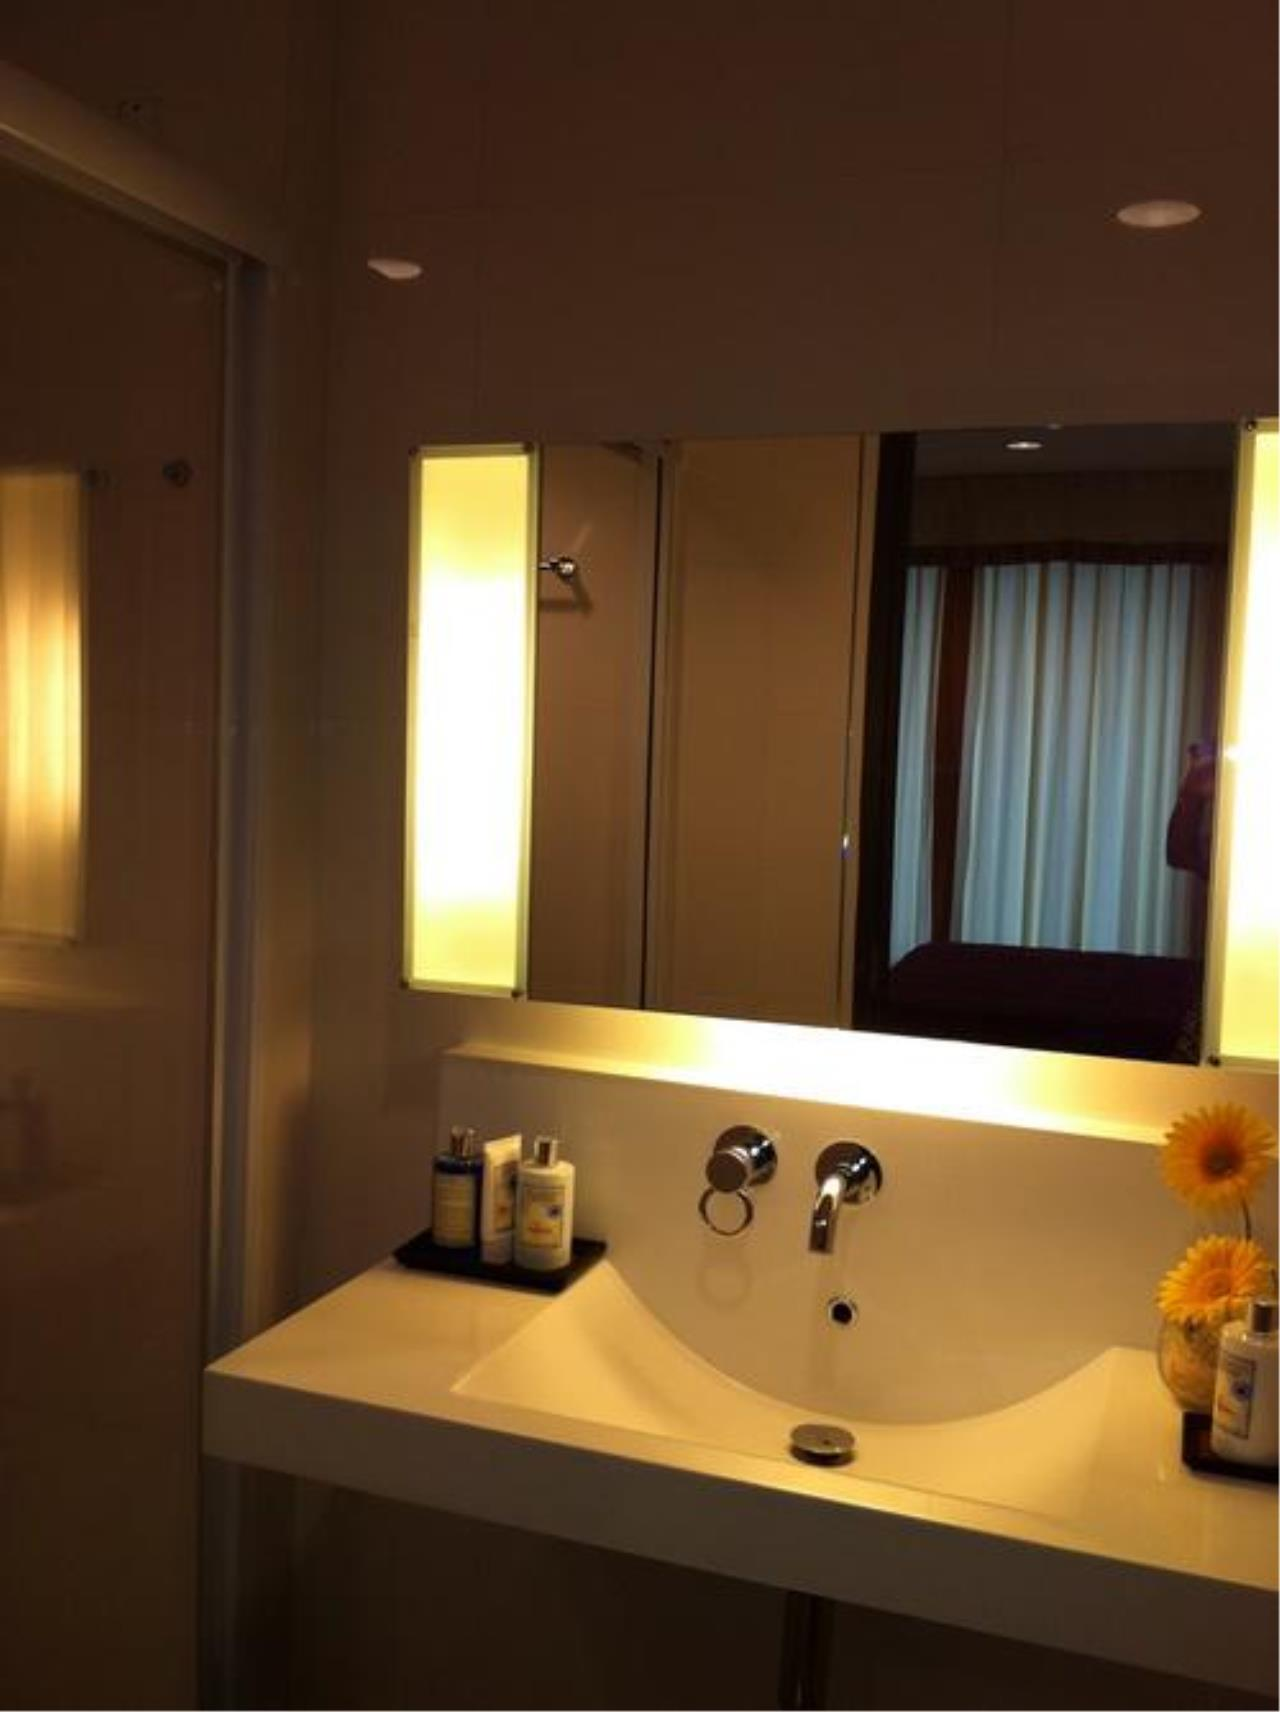 Piri Property Agency's one bedroom  For Rent Rhythm Ratchada - Huay Kwang 4